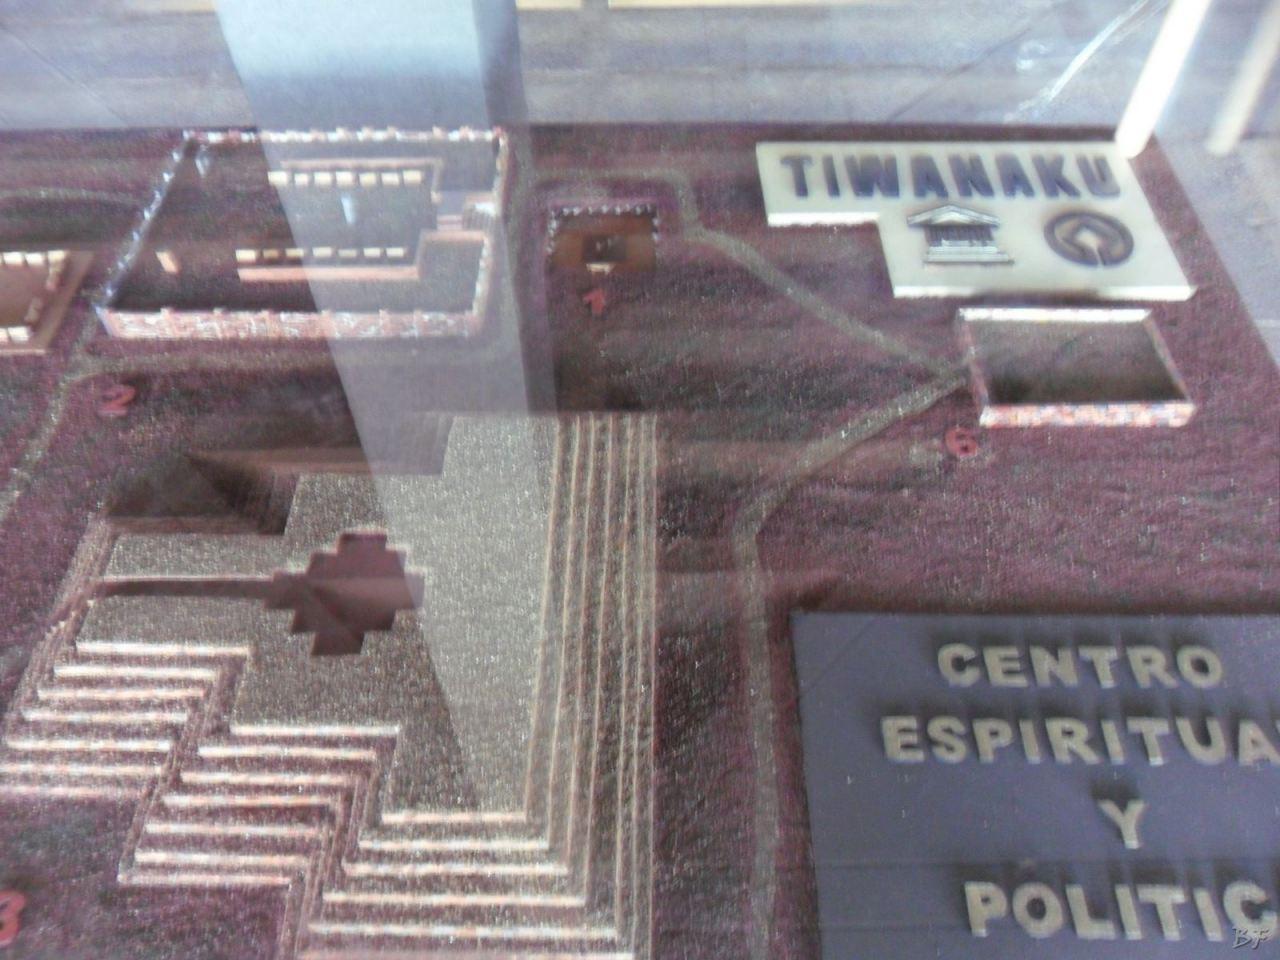 Sito-Megalitico-Piramide-Akapana-Kalasasaya-Menhir-Tiahuanaco-Bolivia-10